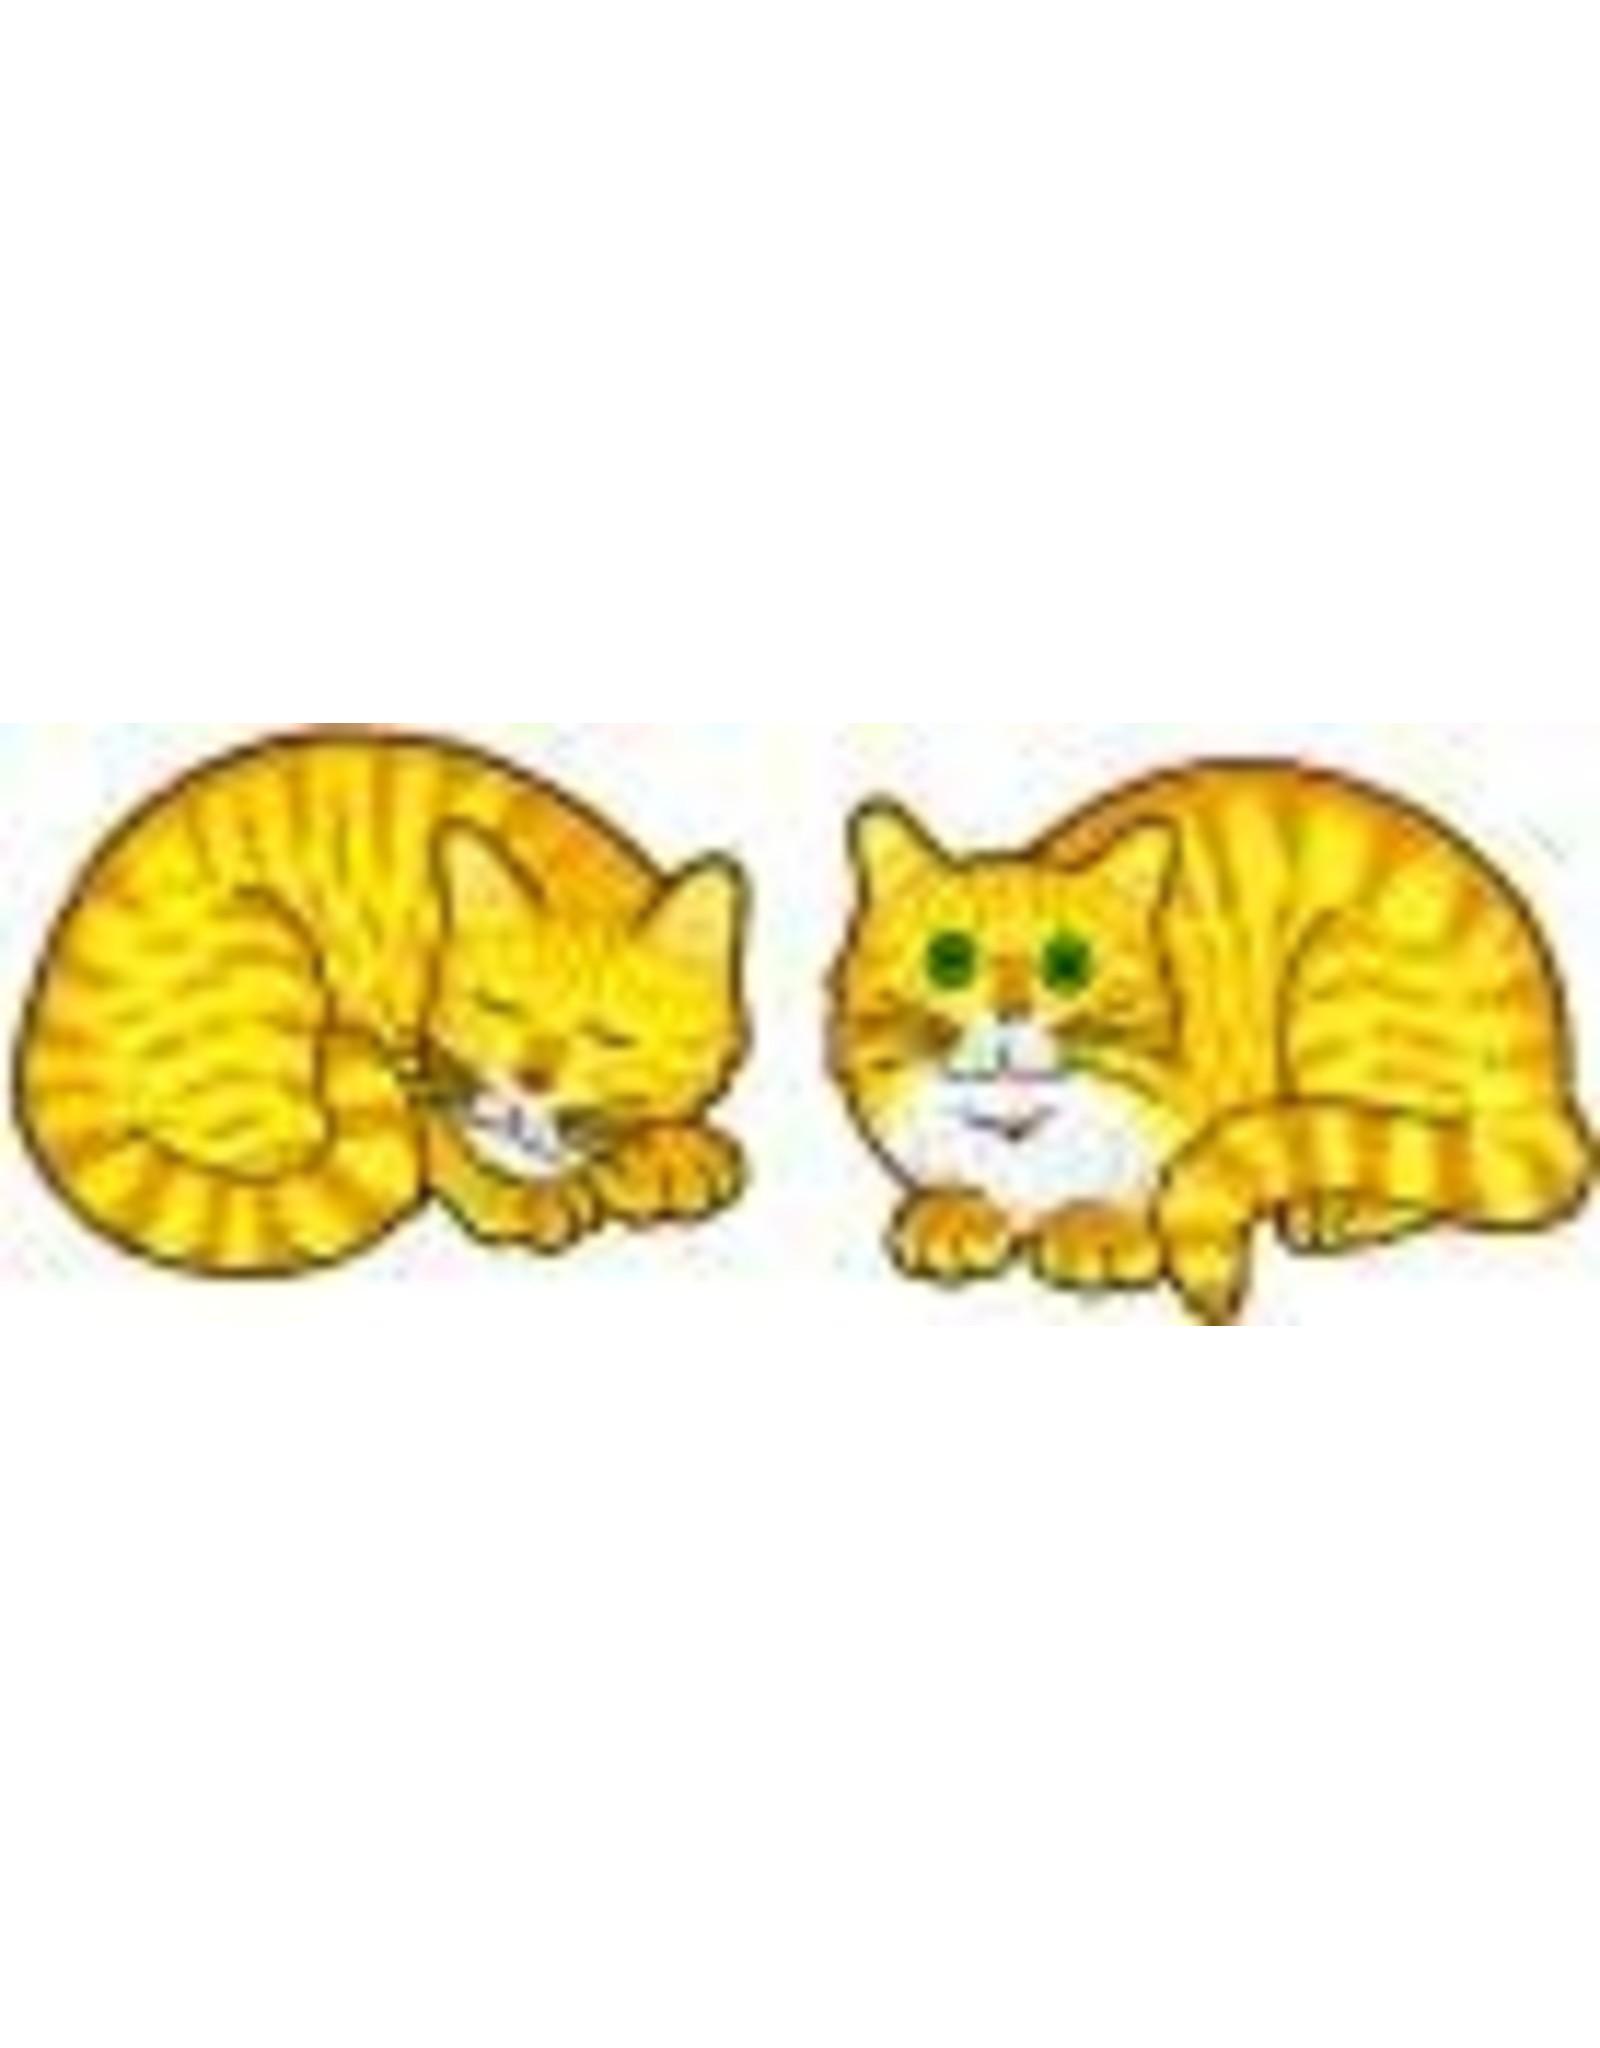 Jabebo Earrings CAT (NAPPING, YELLOW)